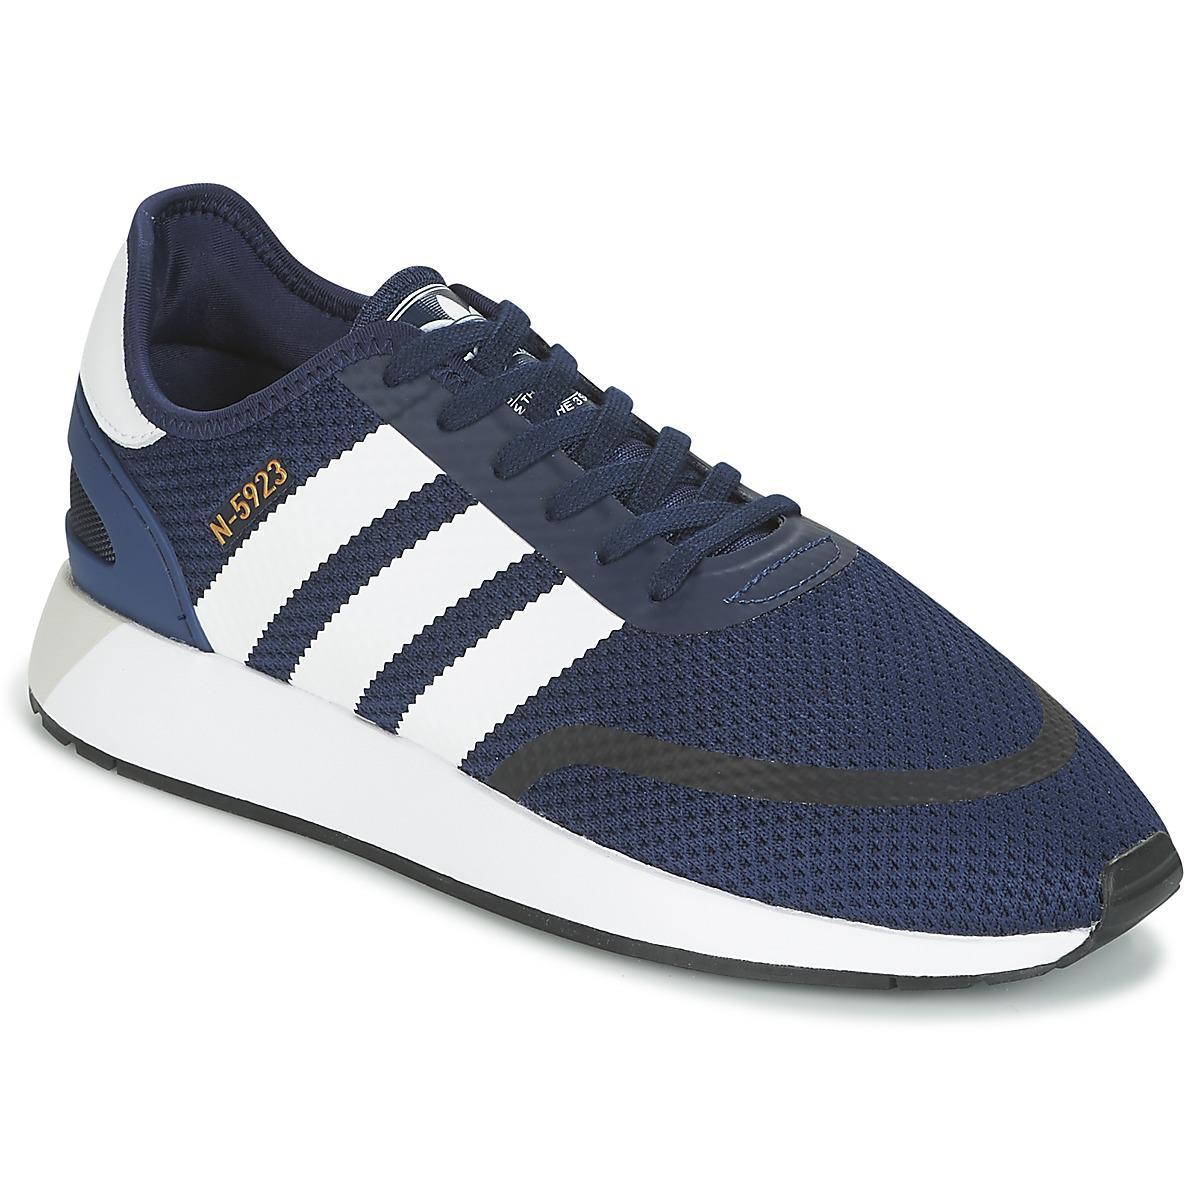 b11242028a Tênis Adidas Feminino. adidas Iniki Runner Cls Shoes (trainers) in Blue -  Lyst